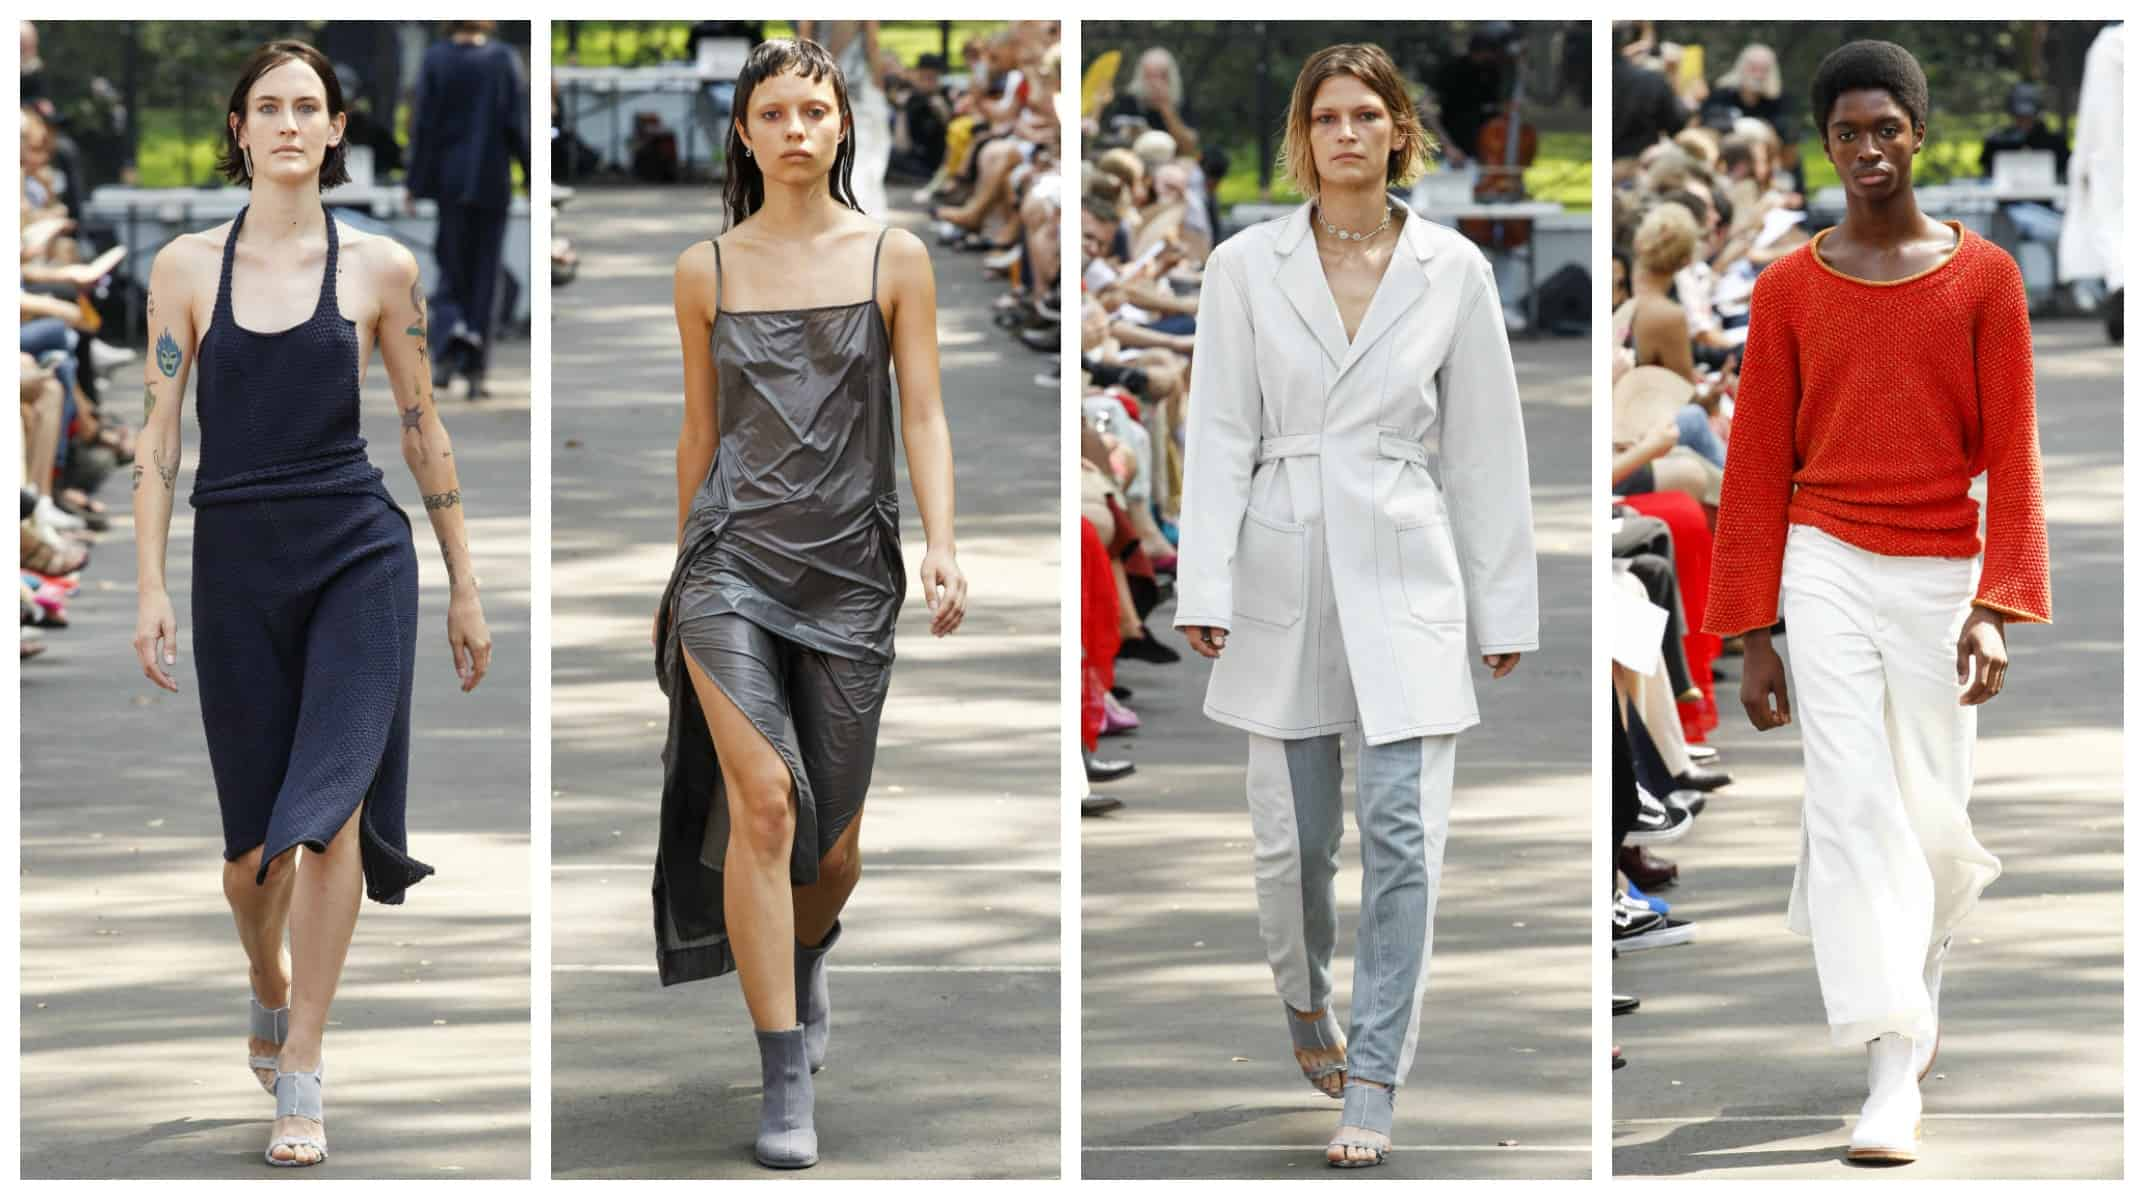 New York Fashion Week Spring 2017 - Eckhaus Latta